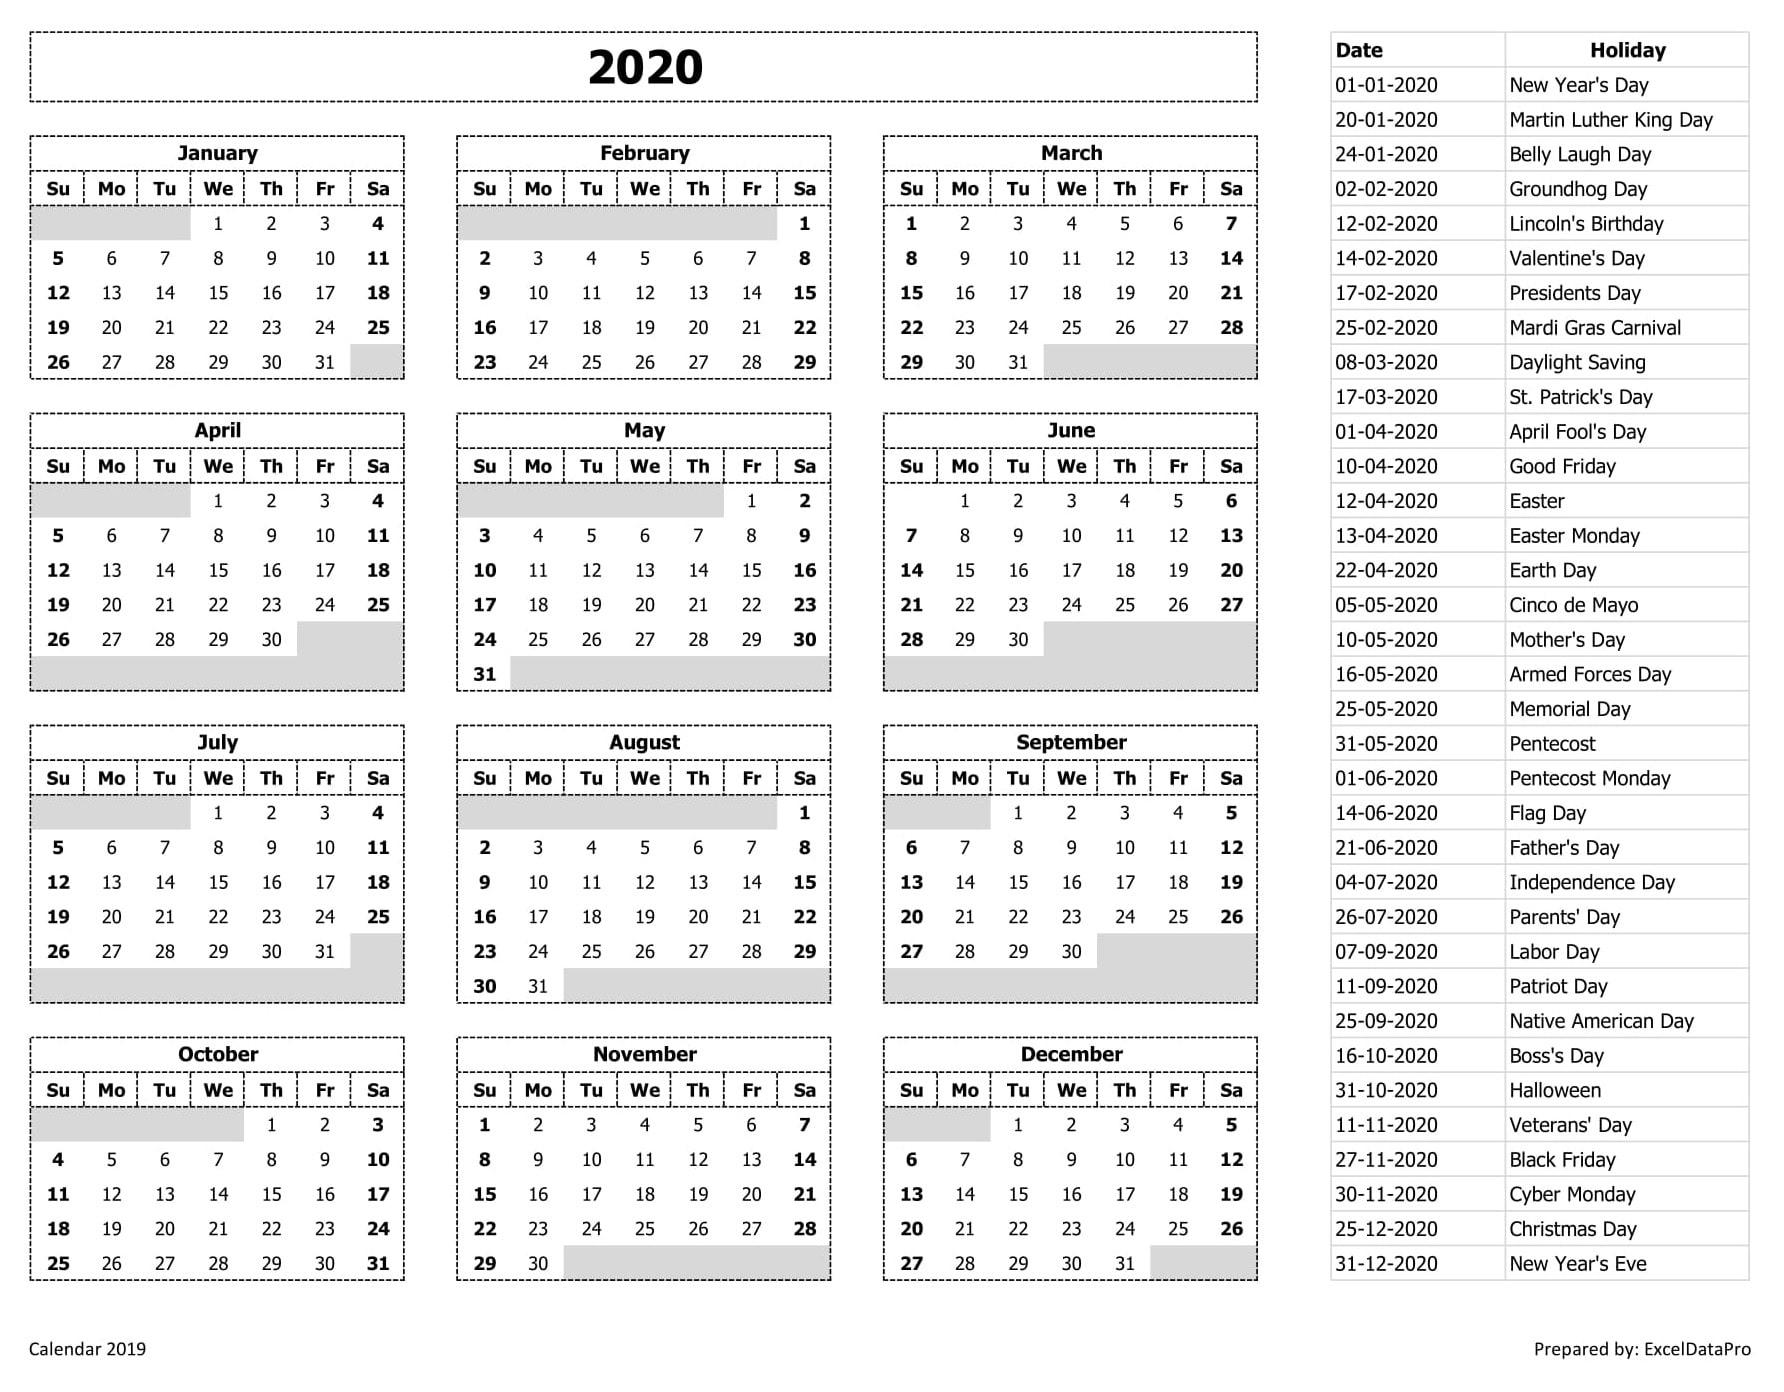 2020 Holiday Calendar List 2020 Calendar Excel Templates, Printable PDFs & Images   ExcelDataPro